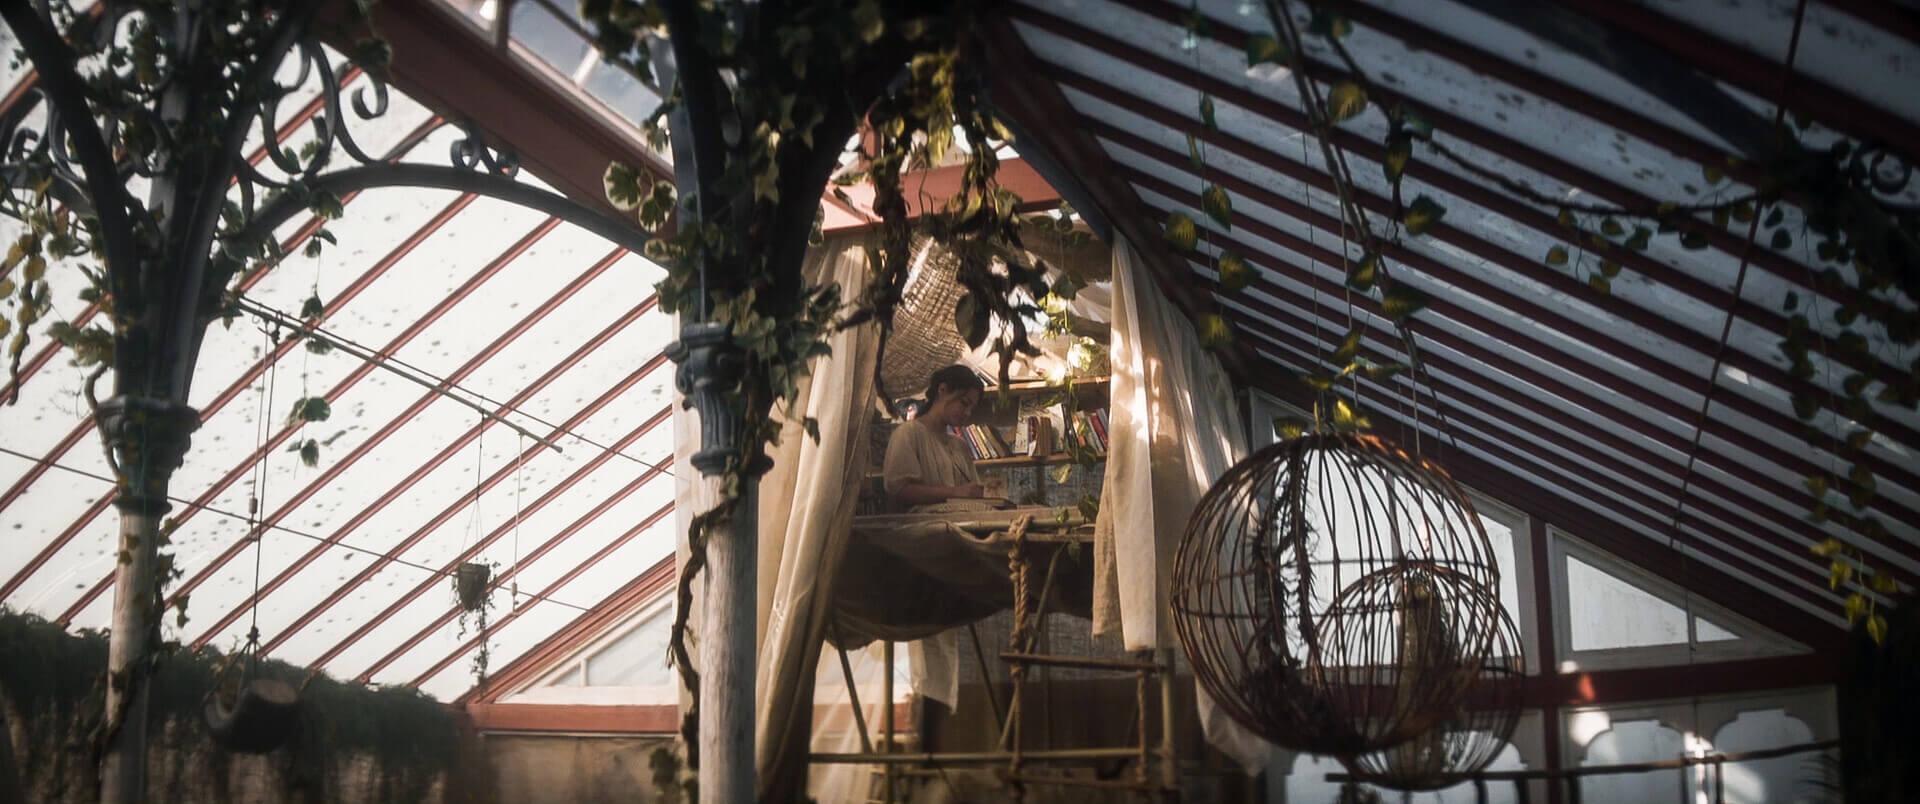 Glasshouse - inside of the glasshouse